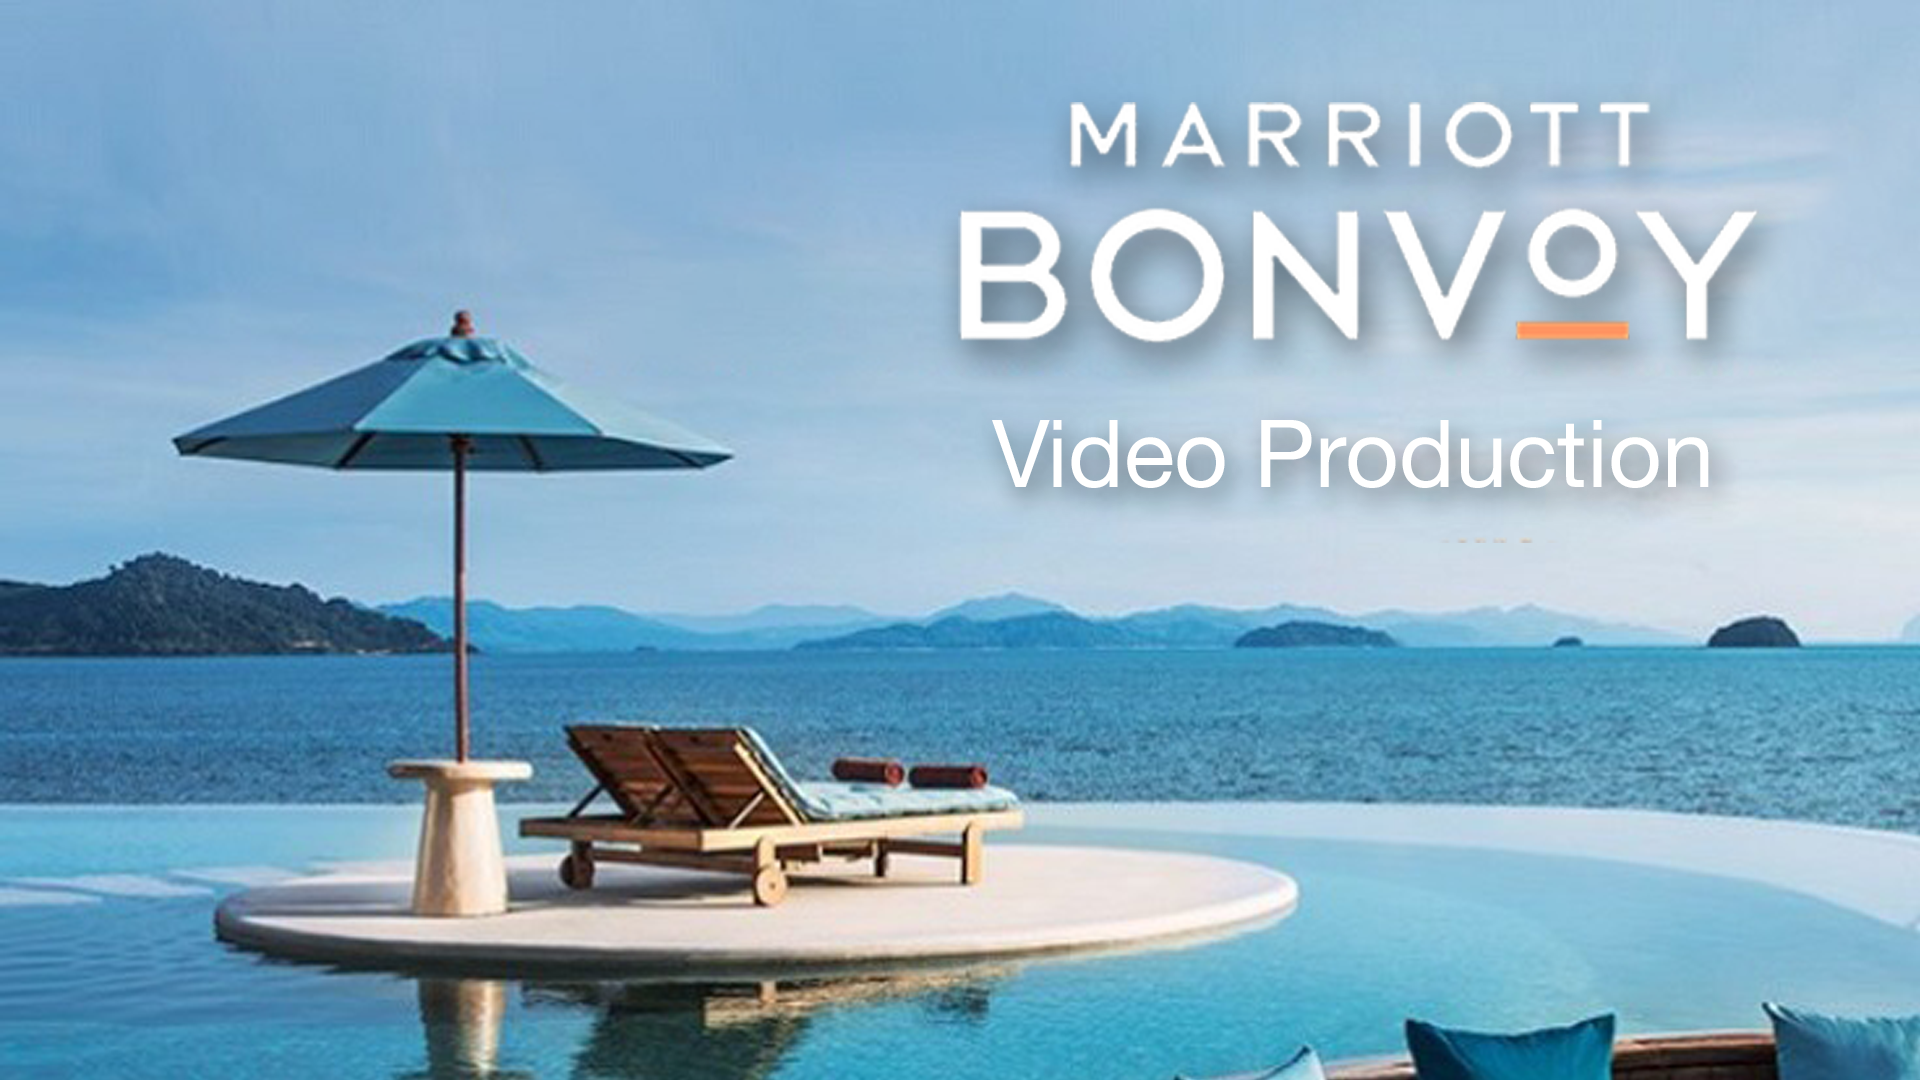 marriott bonvoy video production